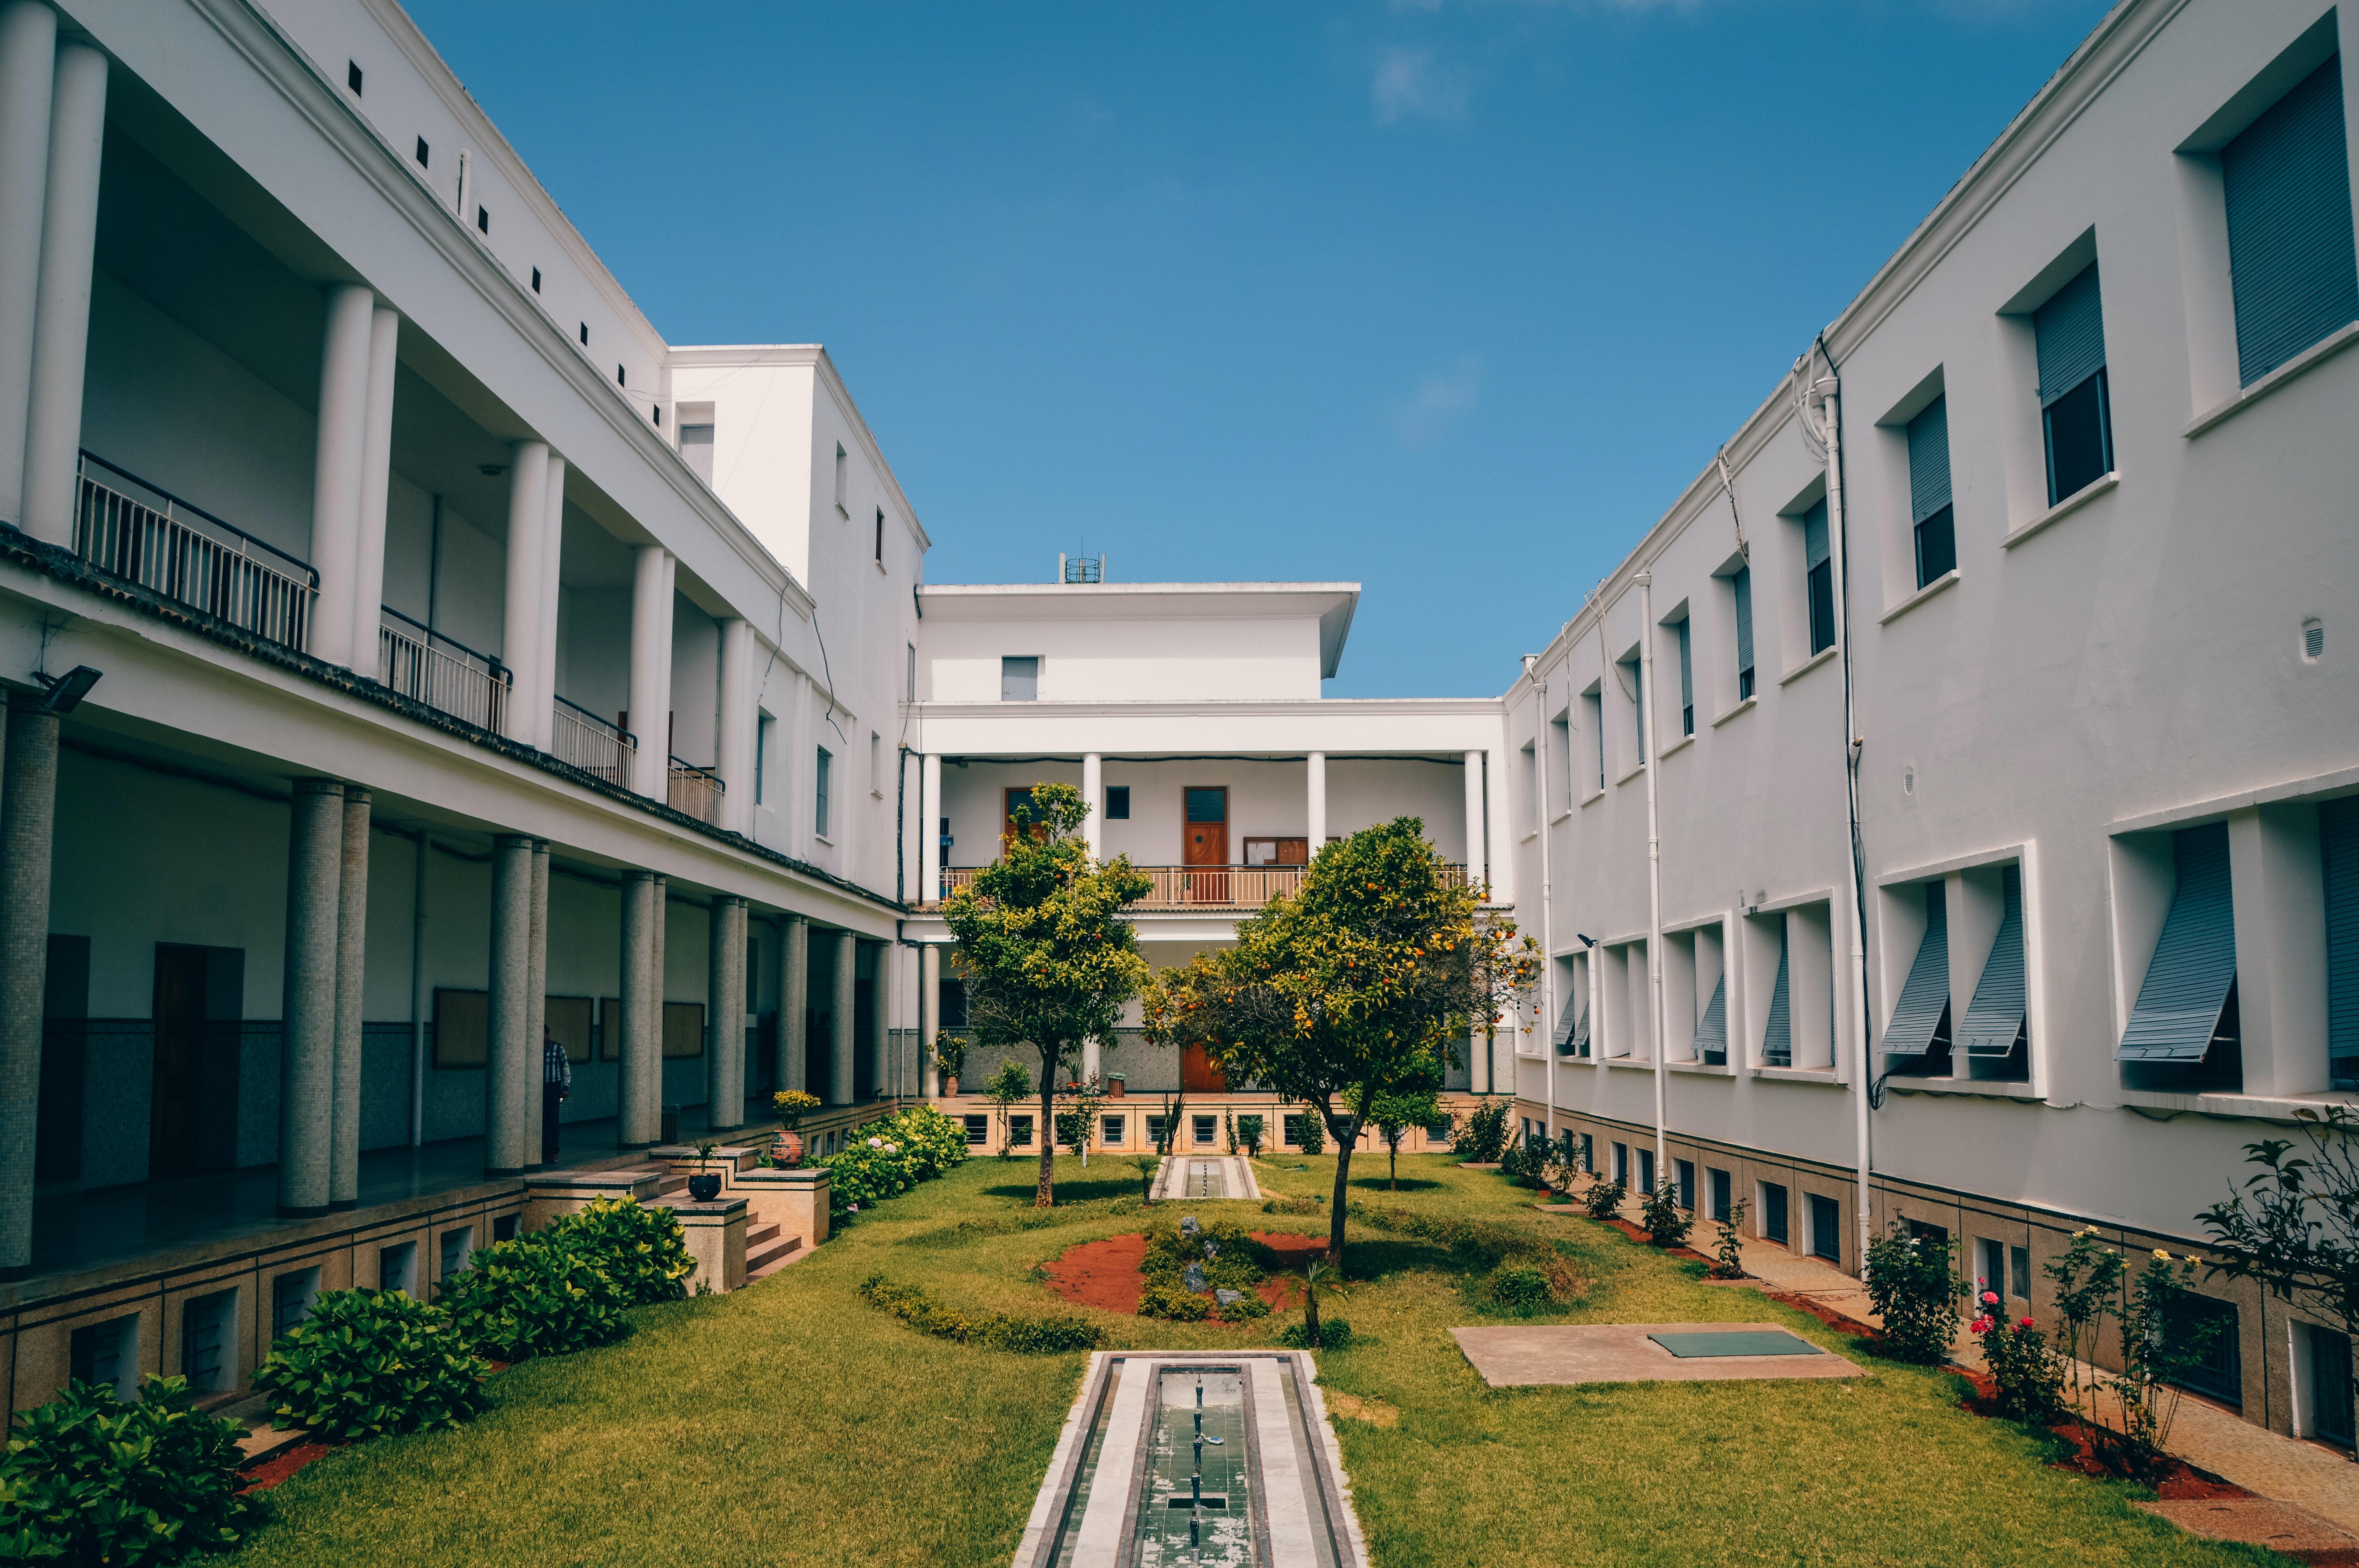 school facilities management software